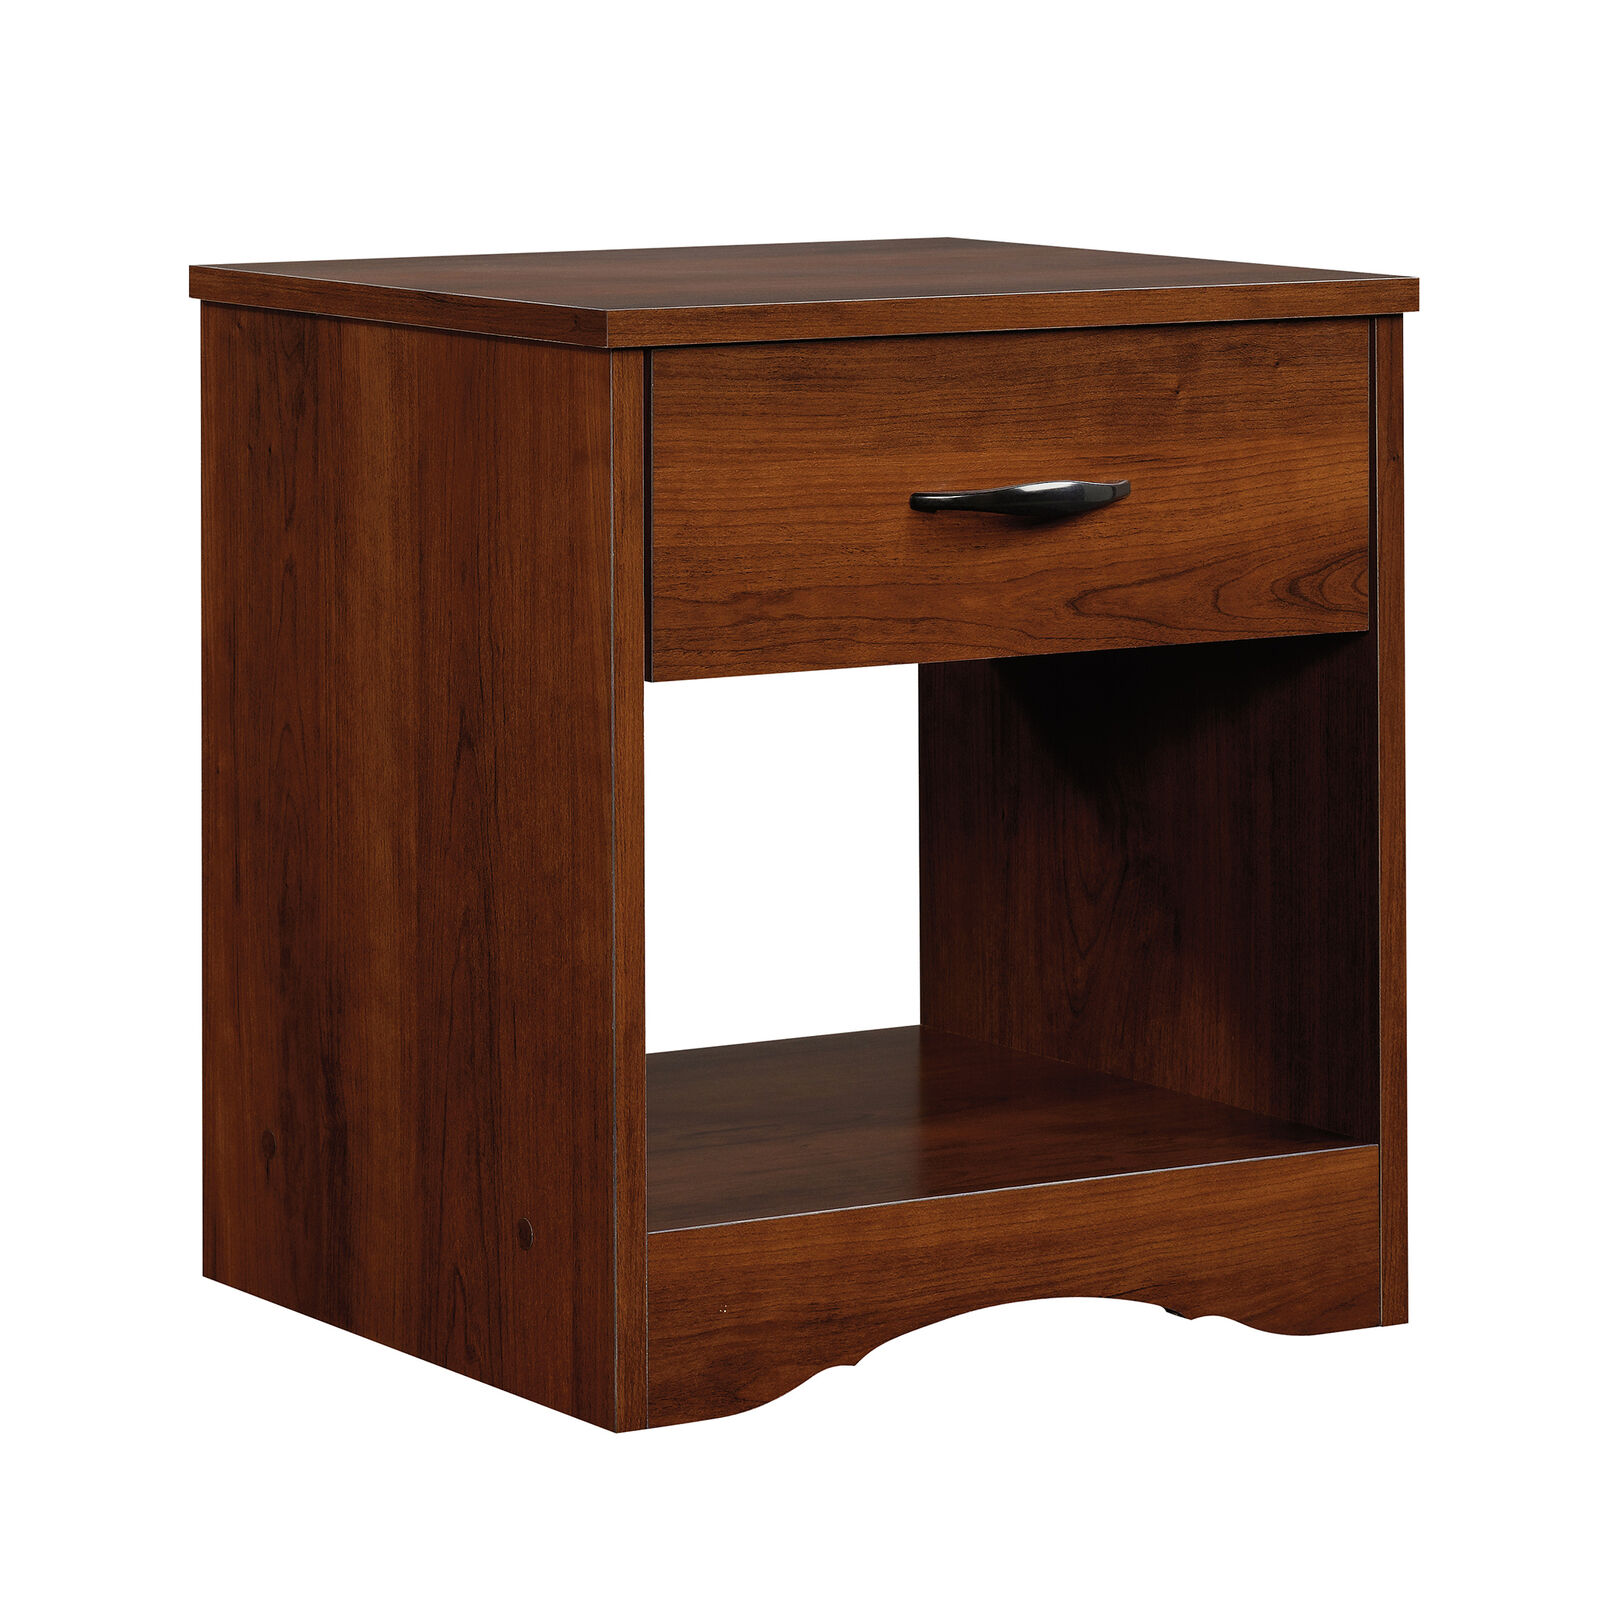 Modern Night Stand Bed Side Lamp Table Shelf Wood Simple Bedroom Furniture Brown Ebay